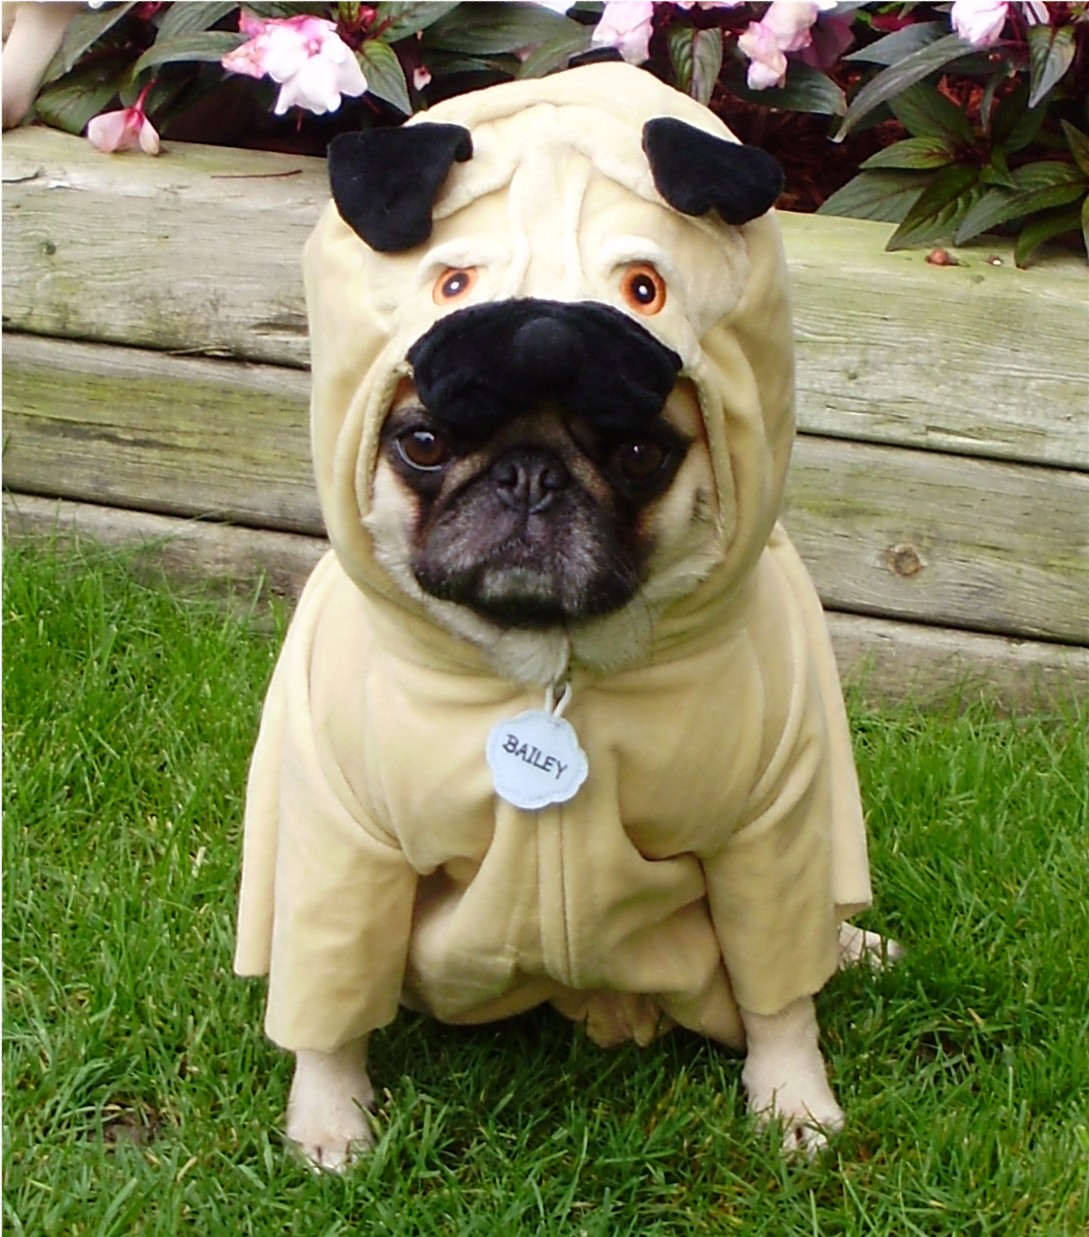 Fullsize Of Pug In Costume